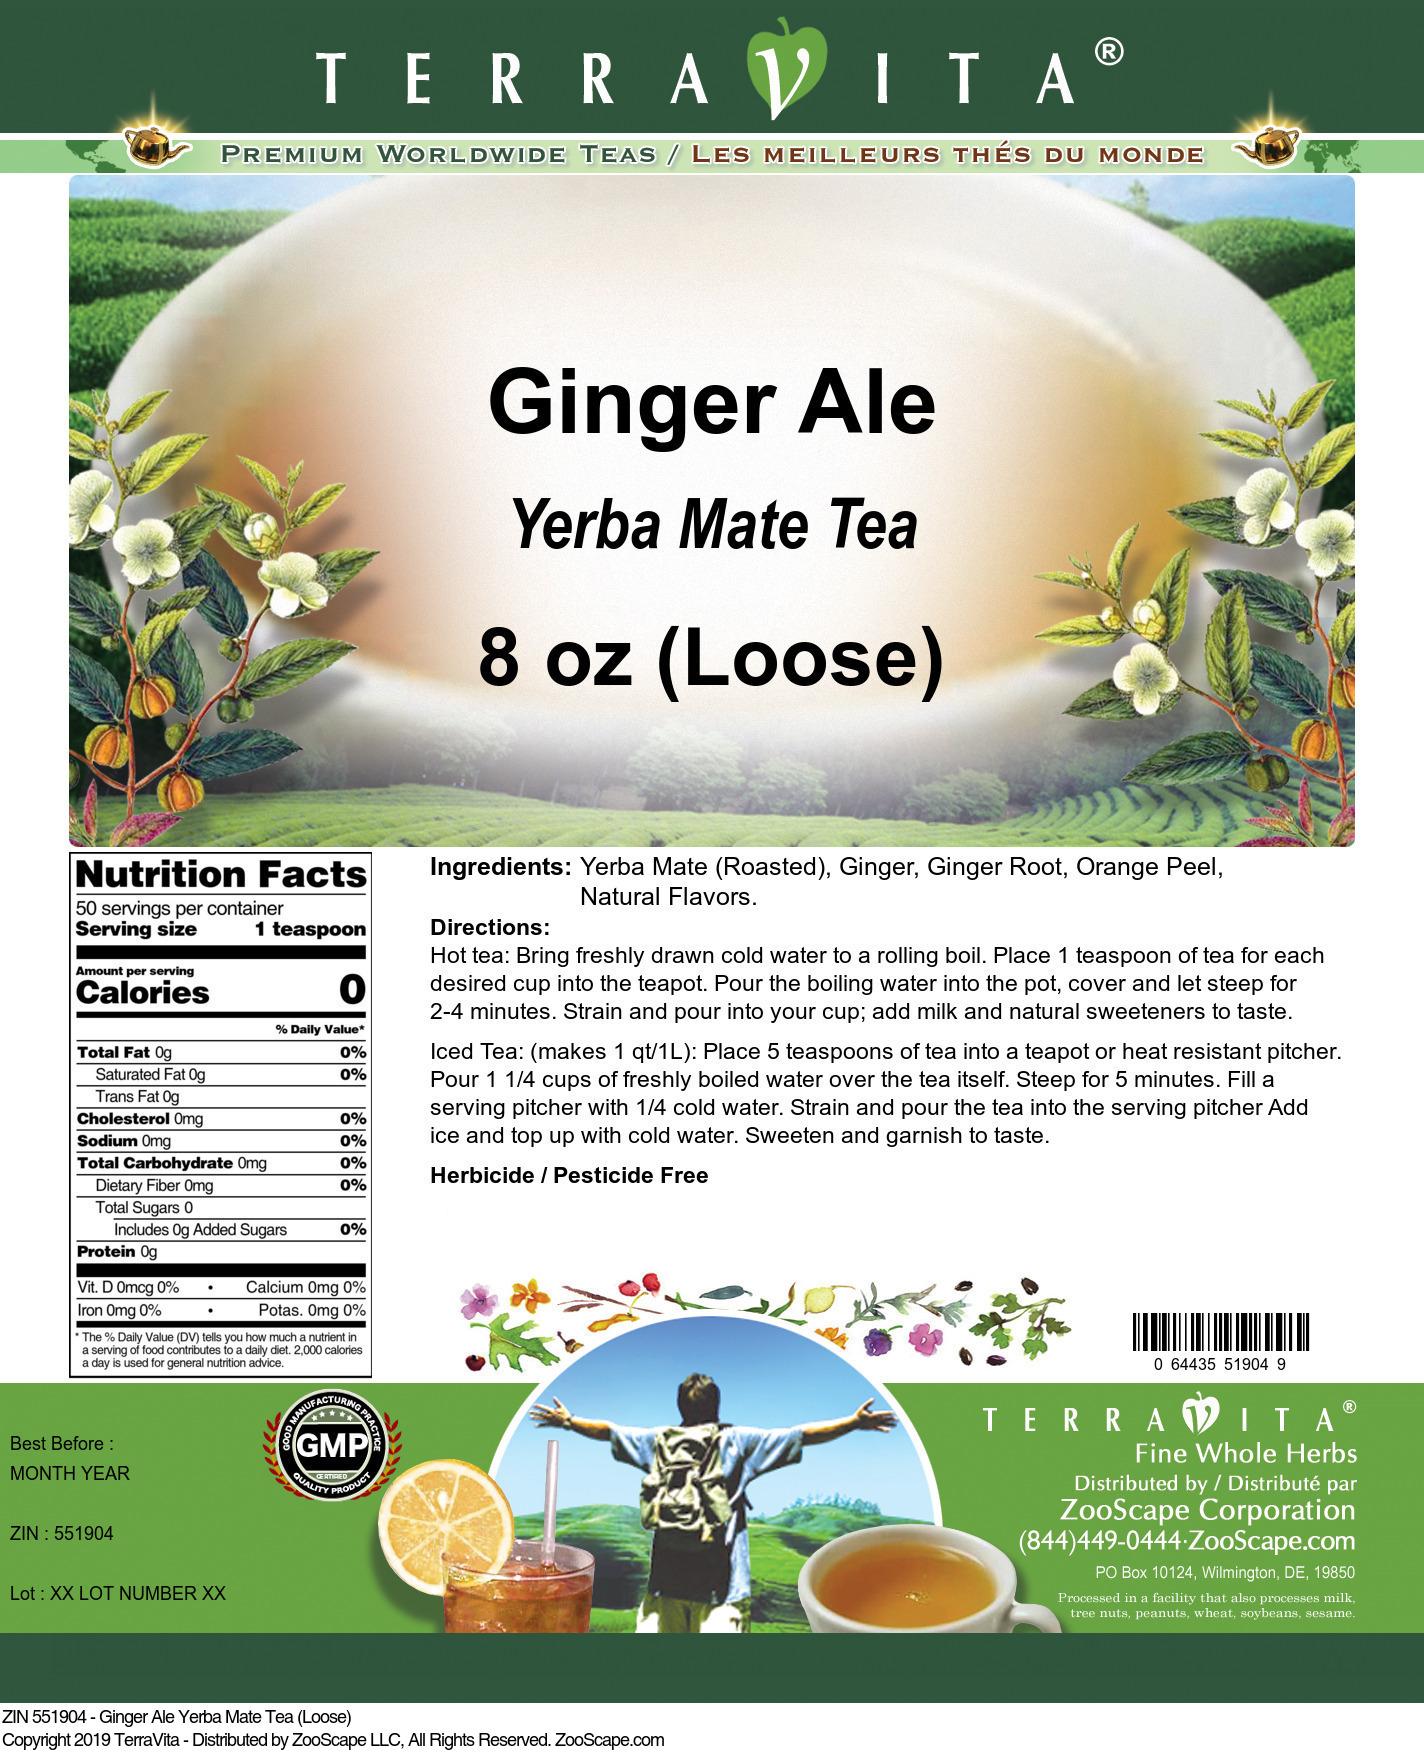 Ginger Ale Yerba Mate